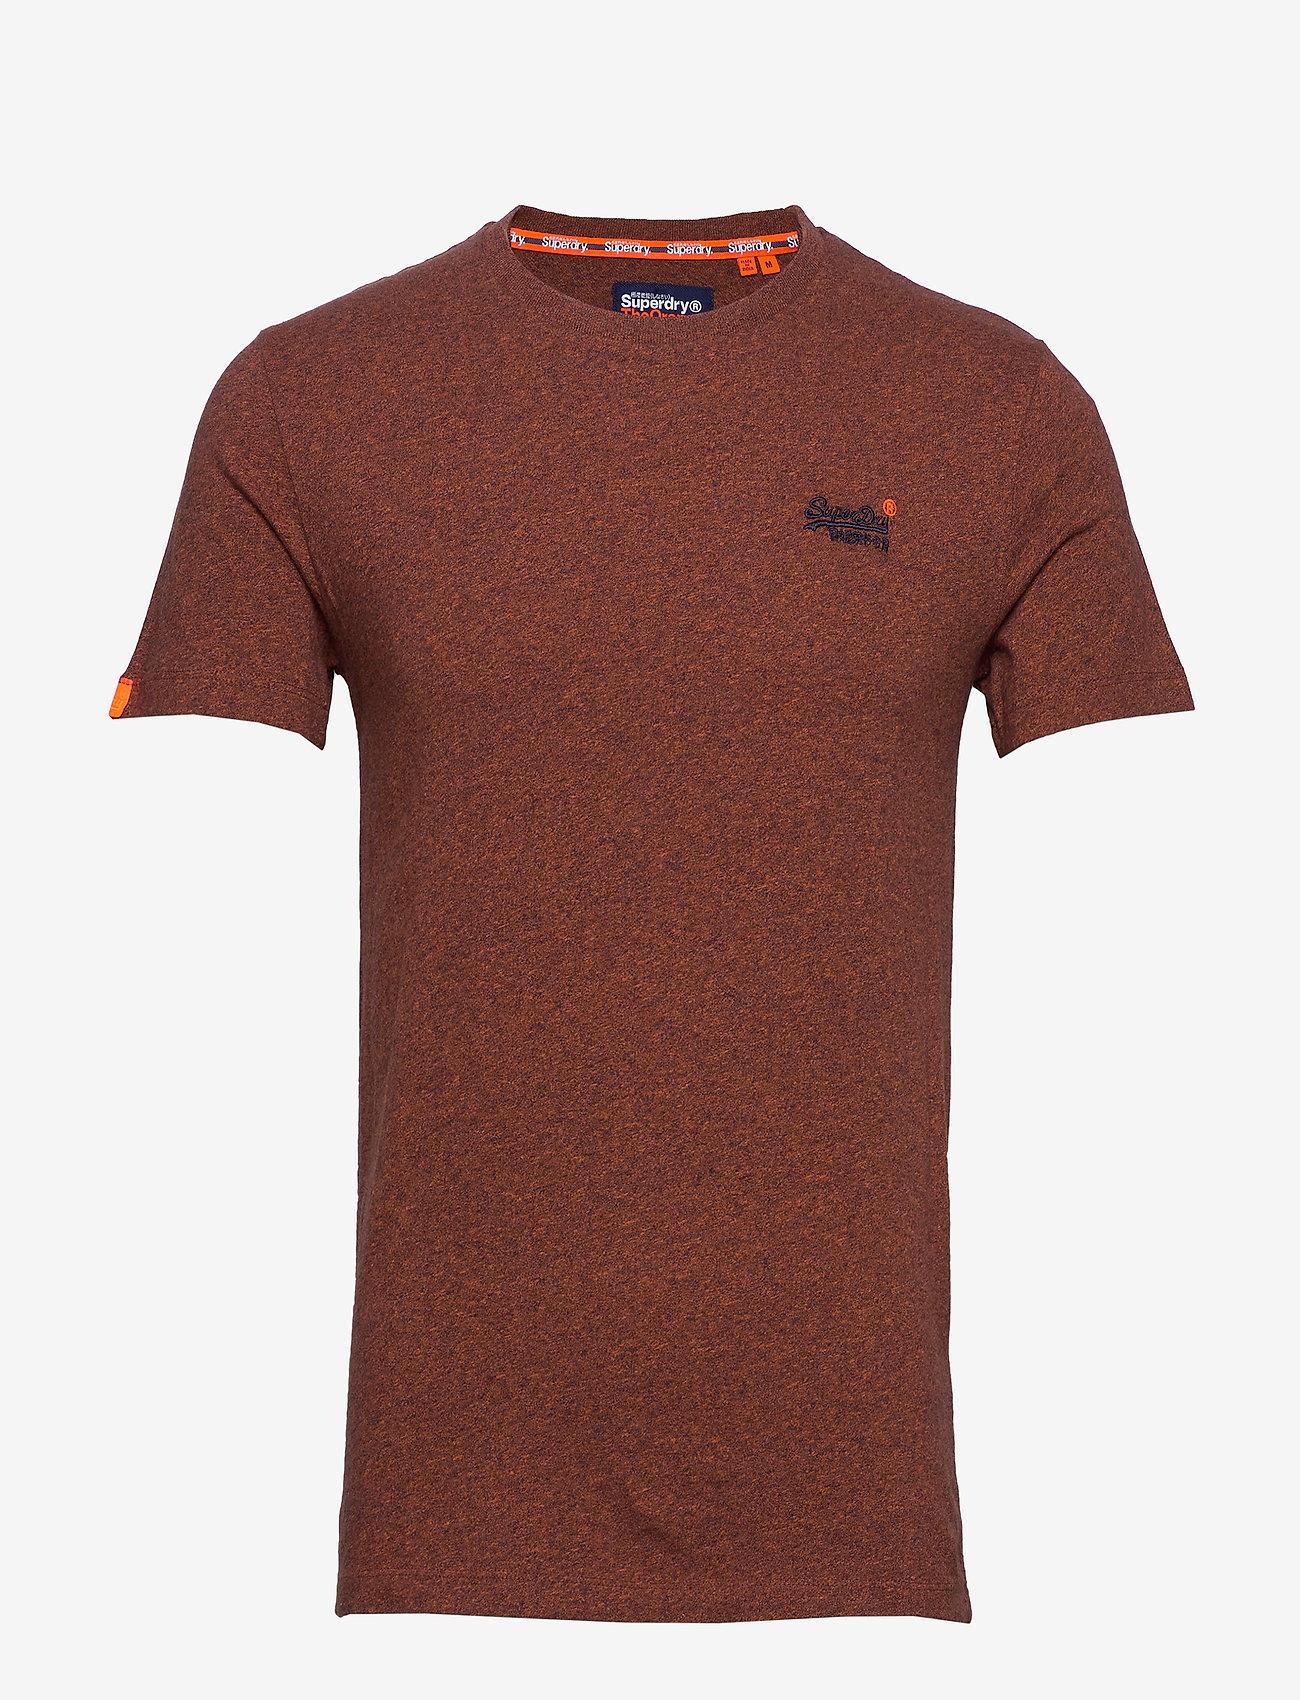 Superdry OL VINTAGE EMB CREW - T-shirts DESERT ORANGE GRIT hdjbdO5E